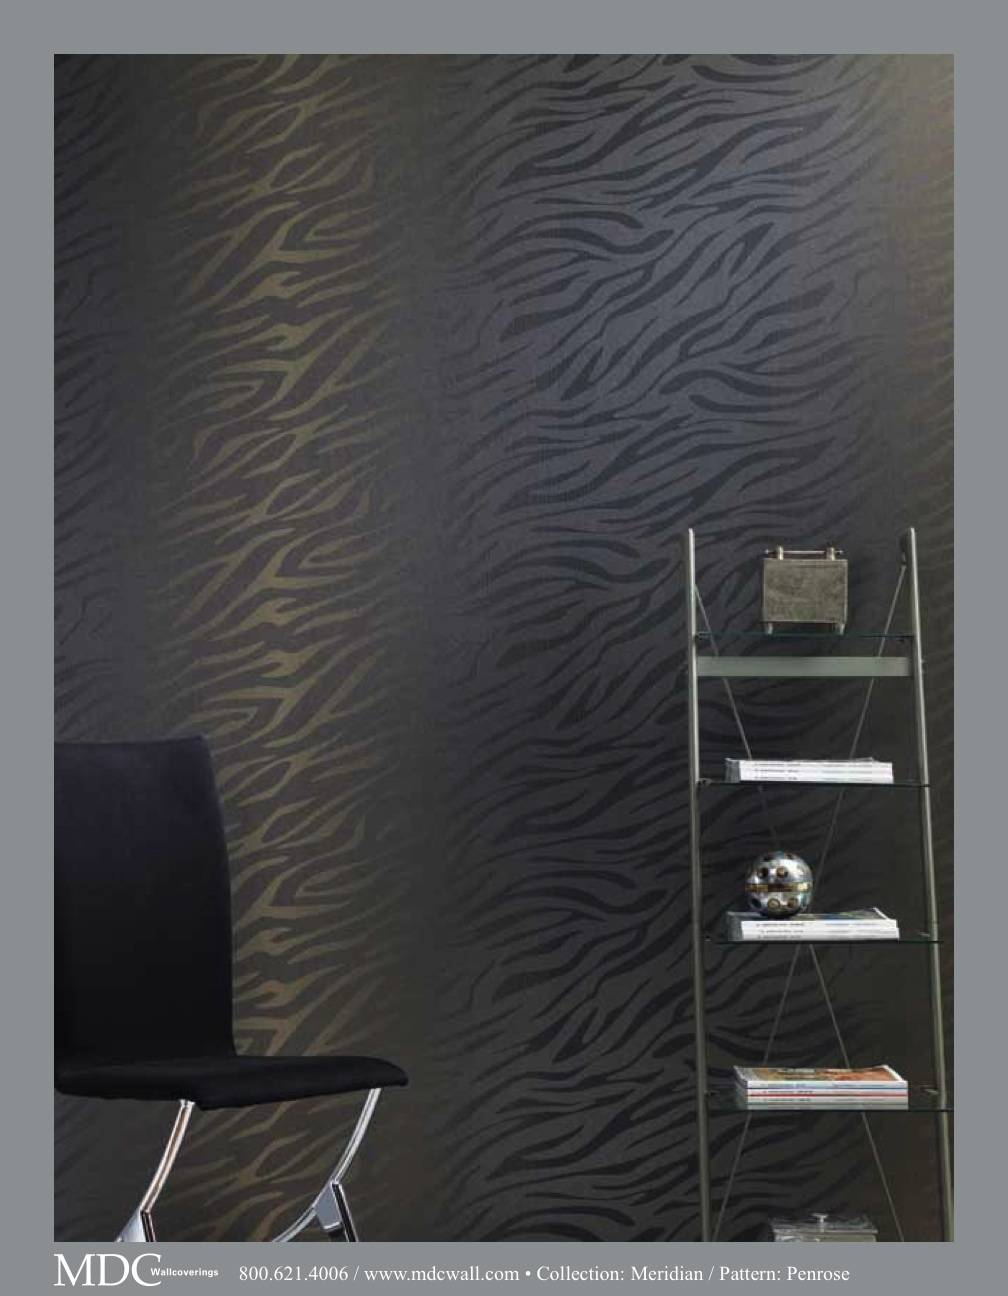 Textured Metallic Wall Covering Wallpaper   Textured Wallpaper 1008x1296